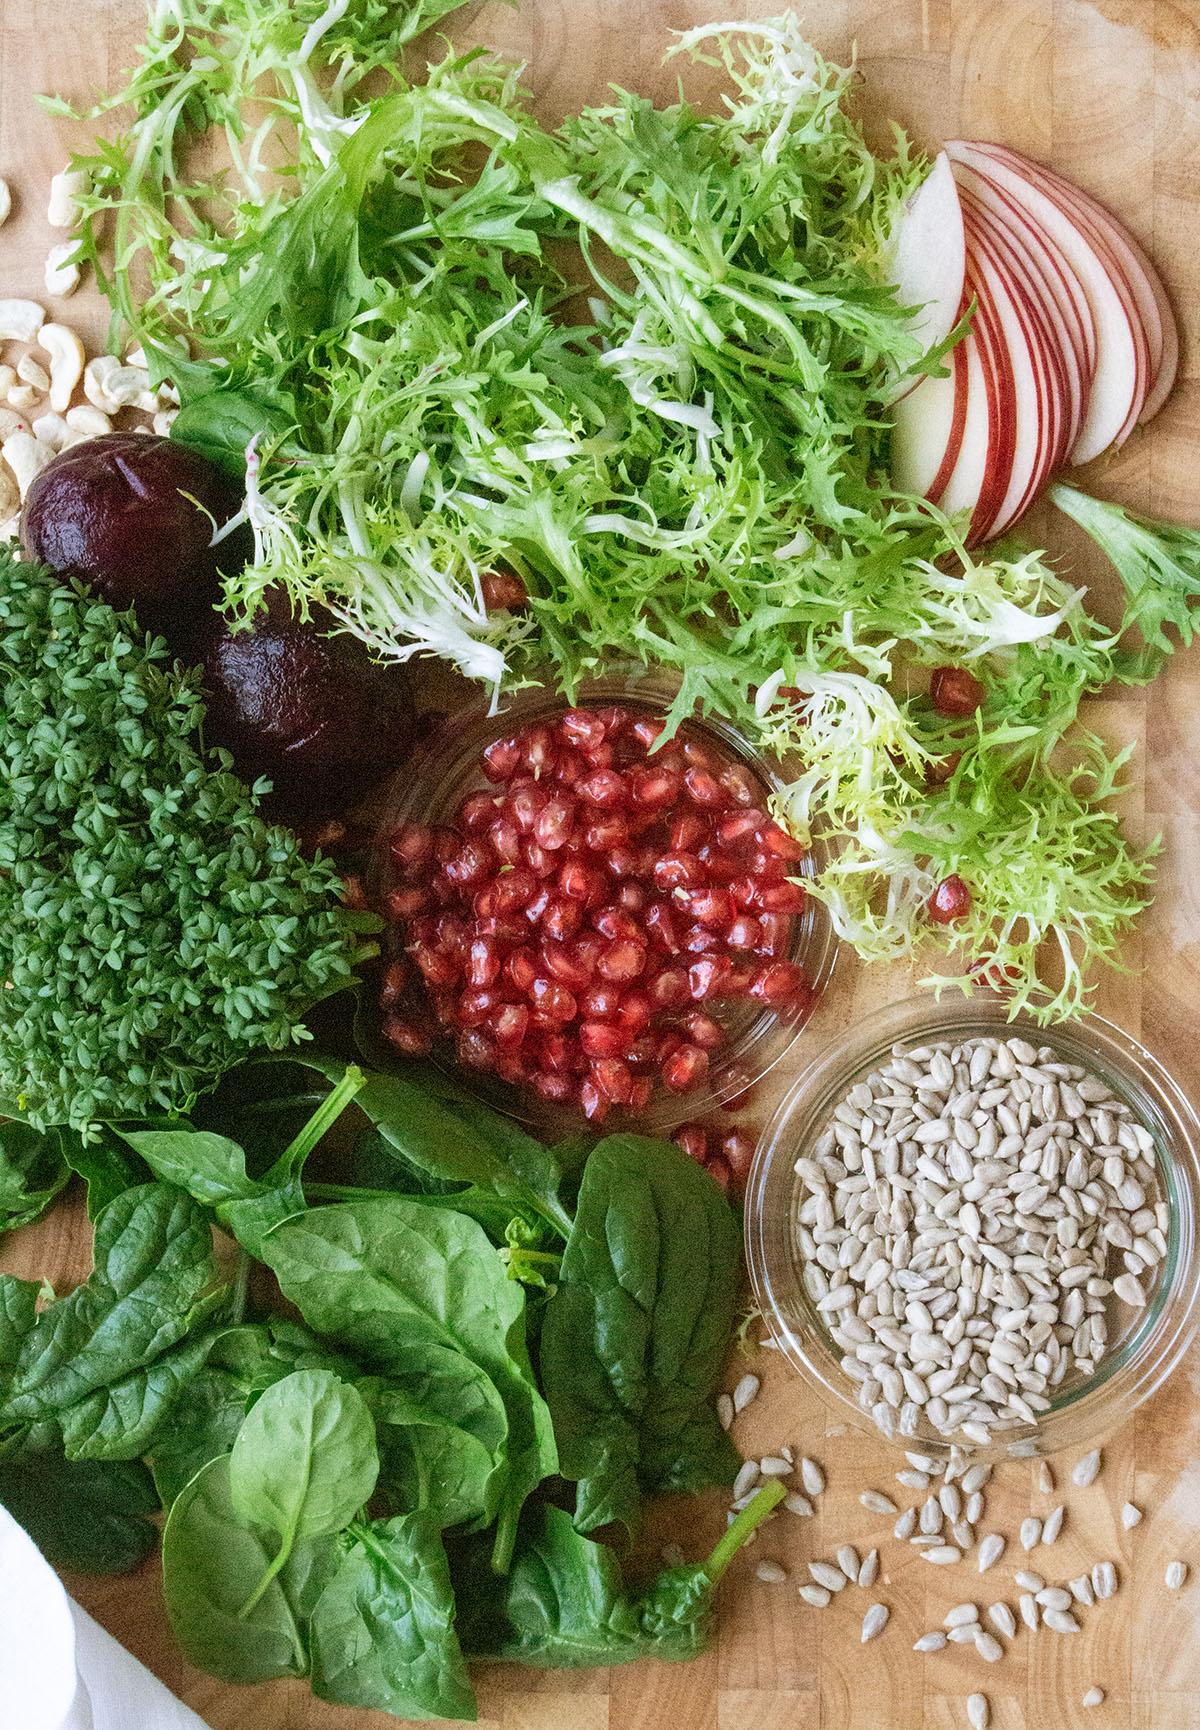 Granatapfelkerne, Spinat, Friseesalat, Kresse, Rote Bete, Sonnenblumenkerne